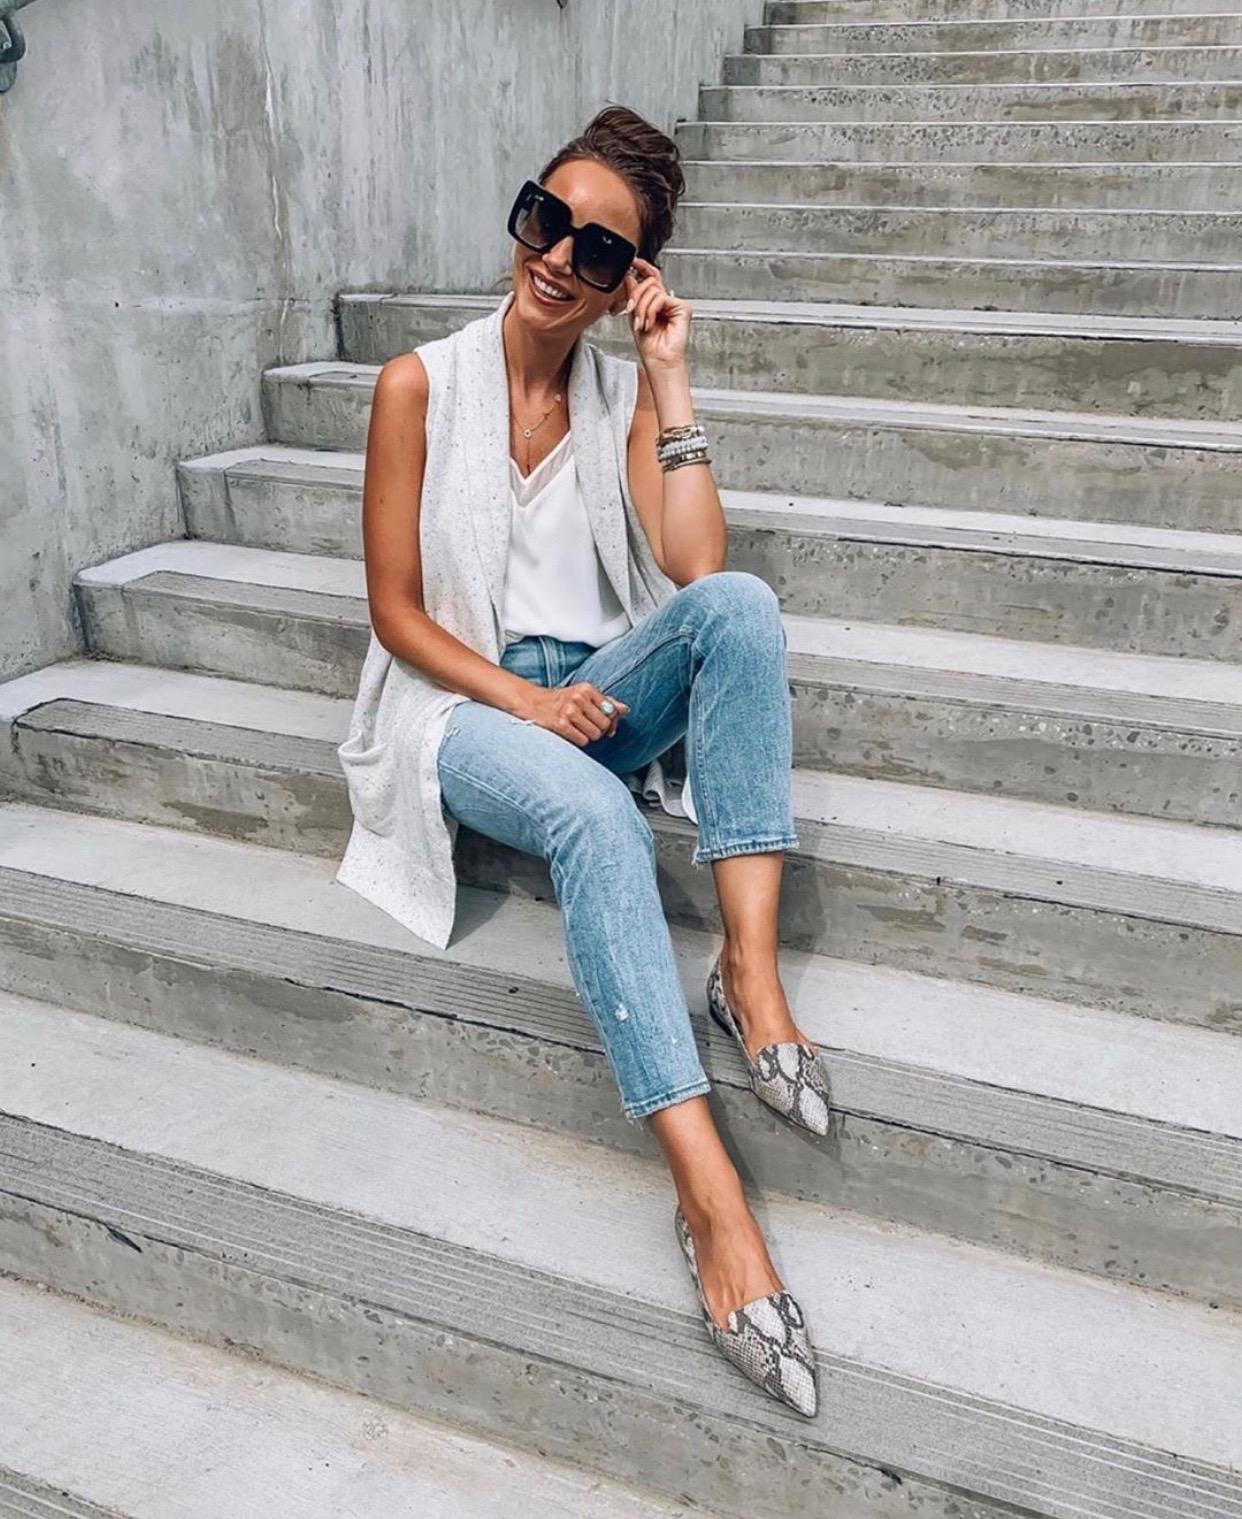 Snakeskin Loafers, Jeans, Sweater Vest